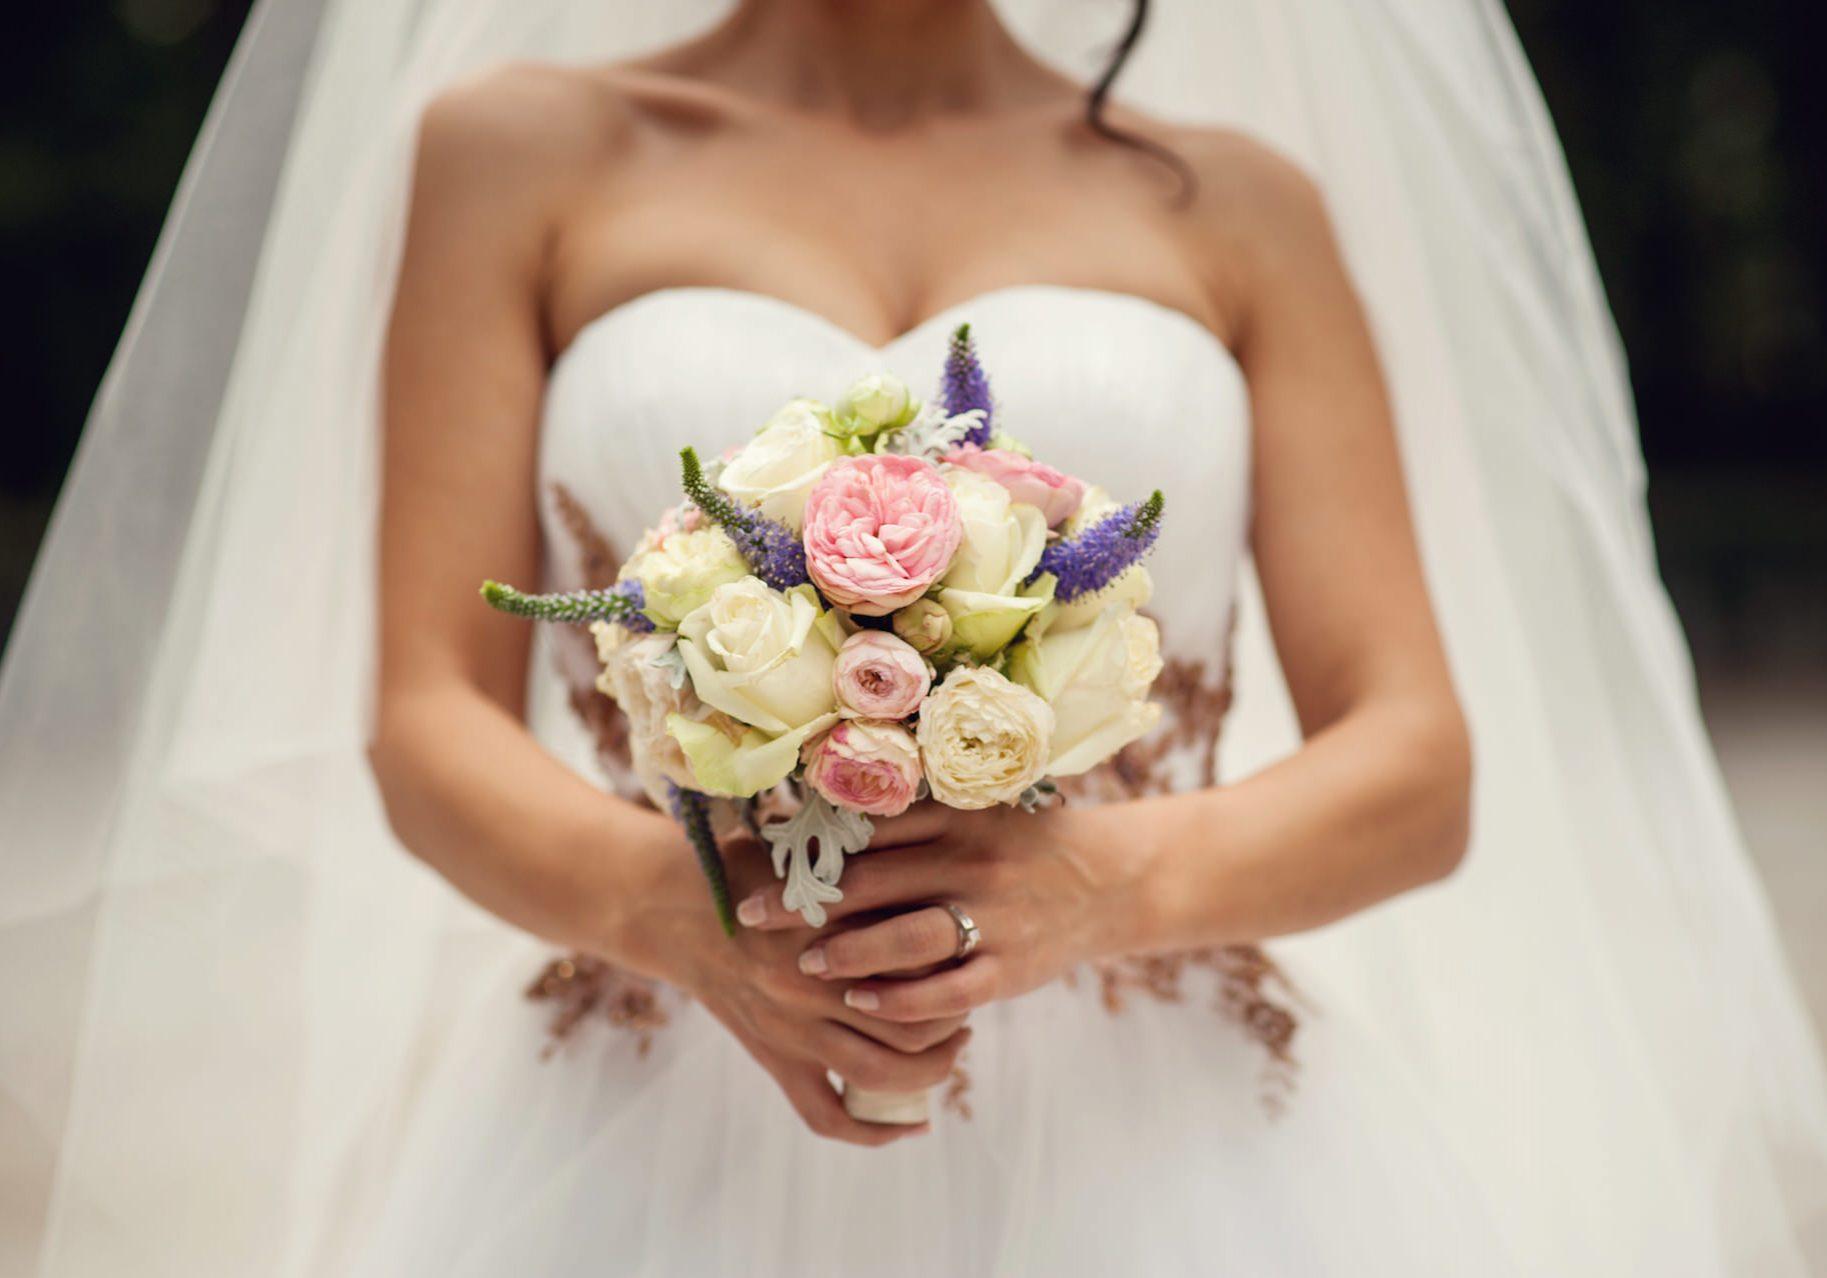 Bride hands with wedding bouquet